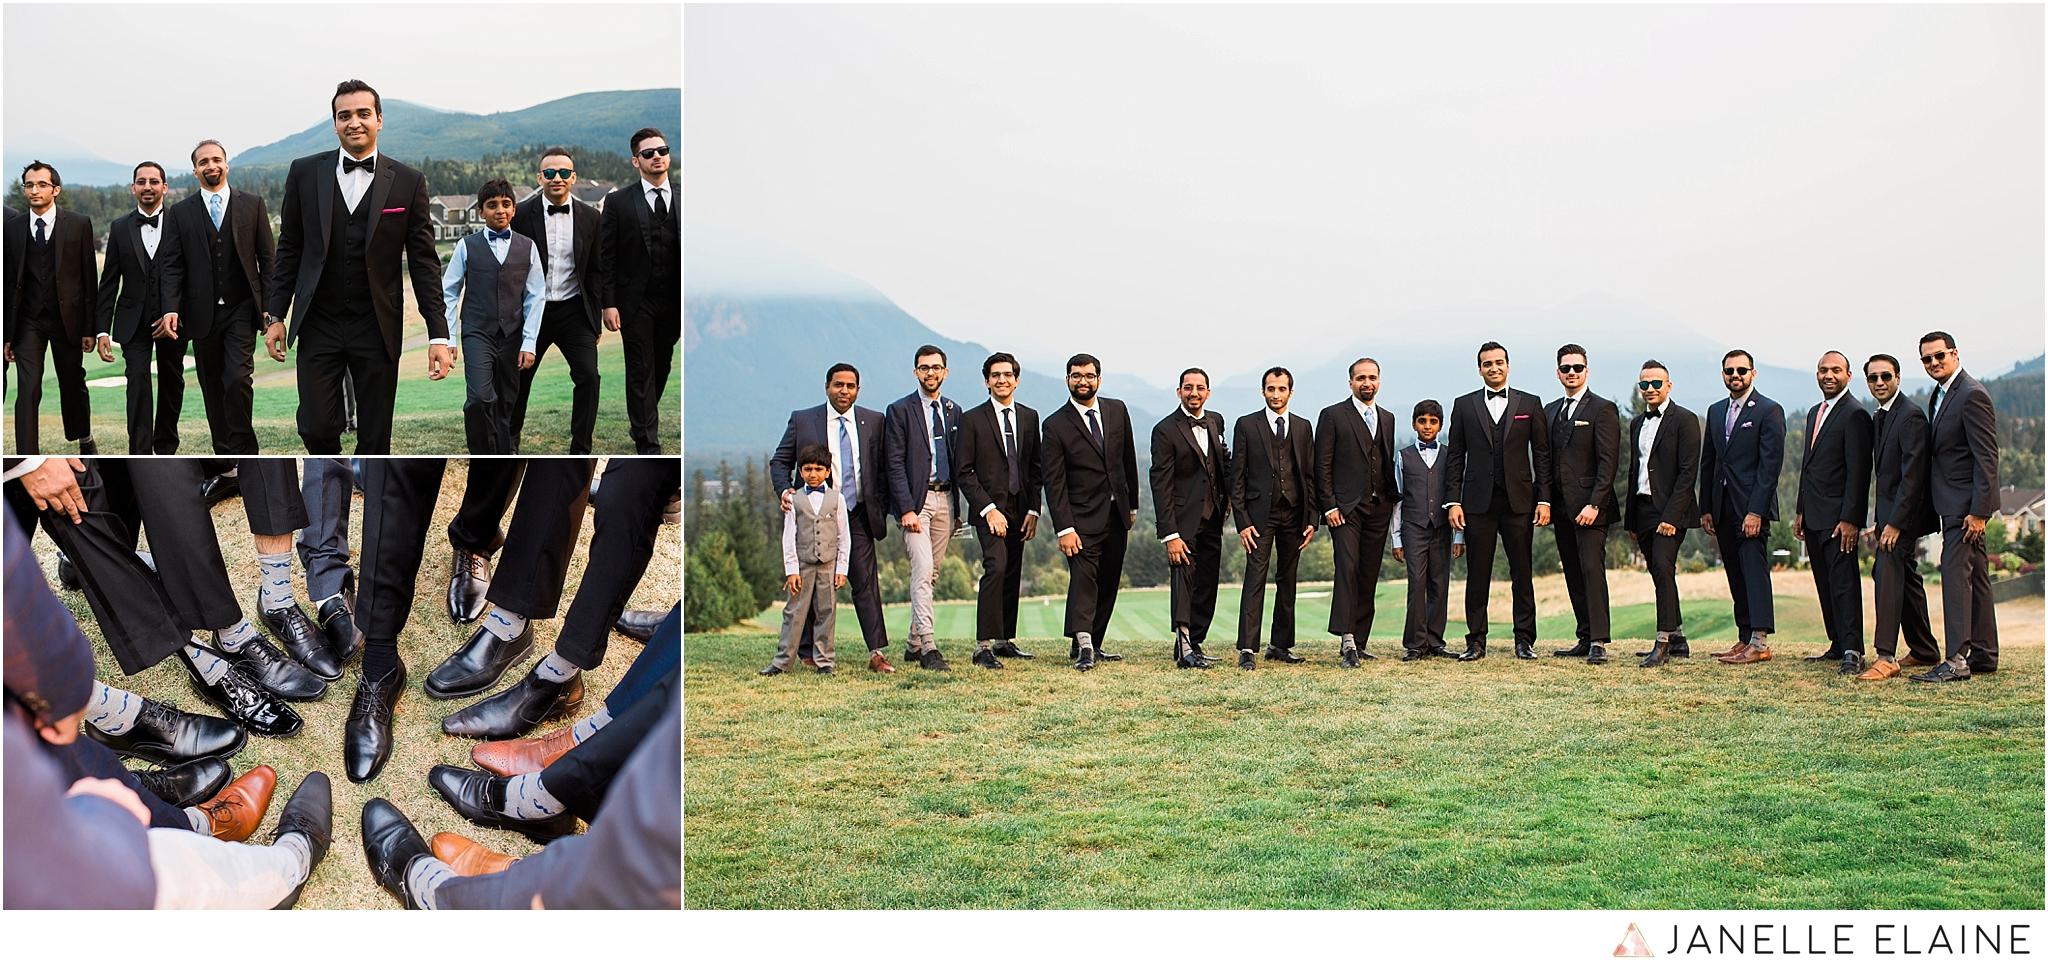 janelle elaine photography-the club at snoqualmie ridge-washington-wedding-photography-rec-13.jpg